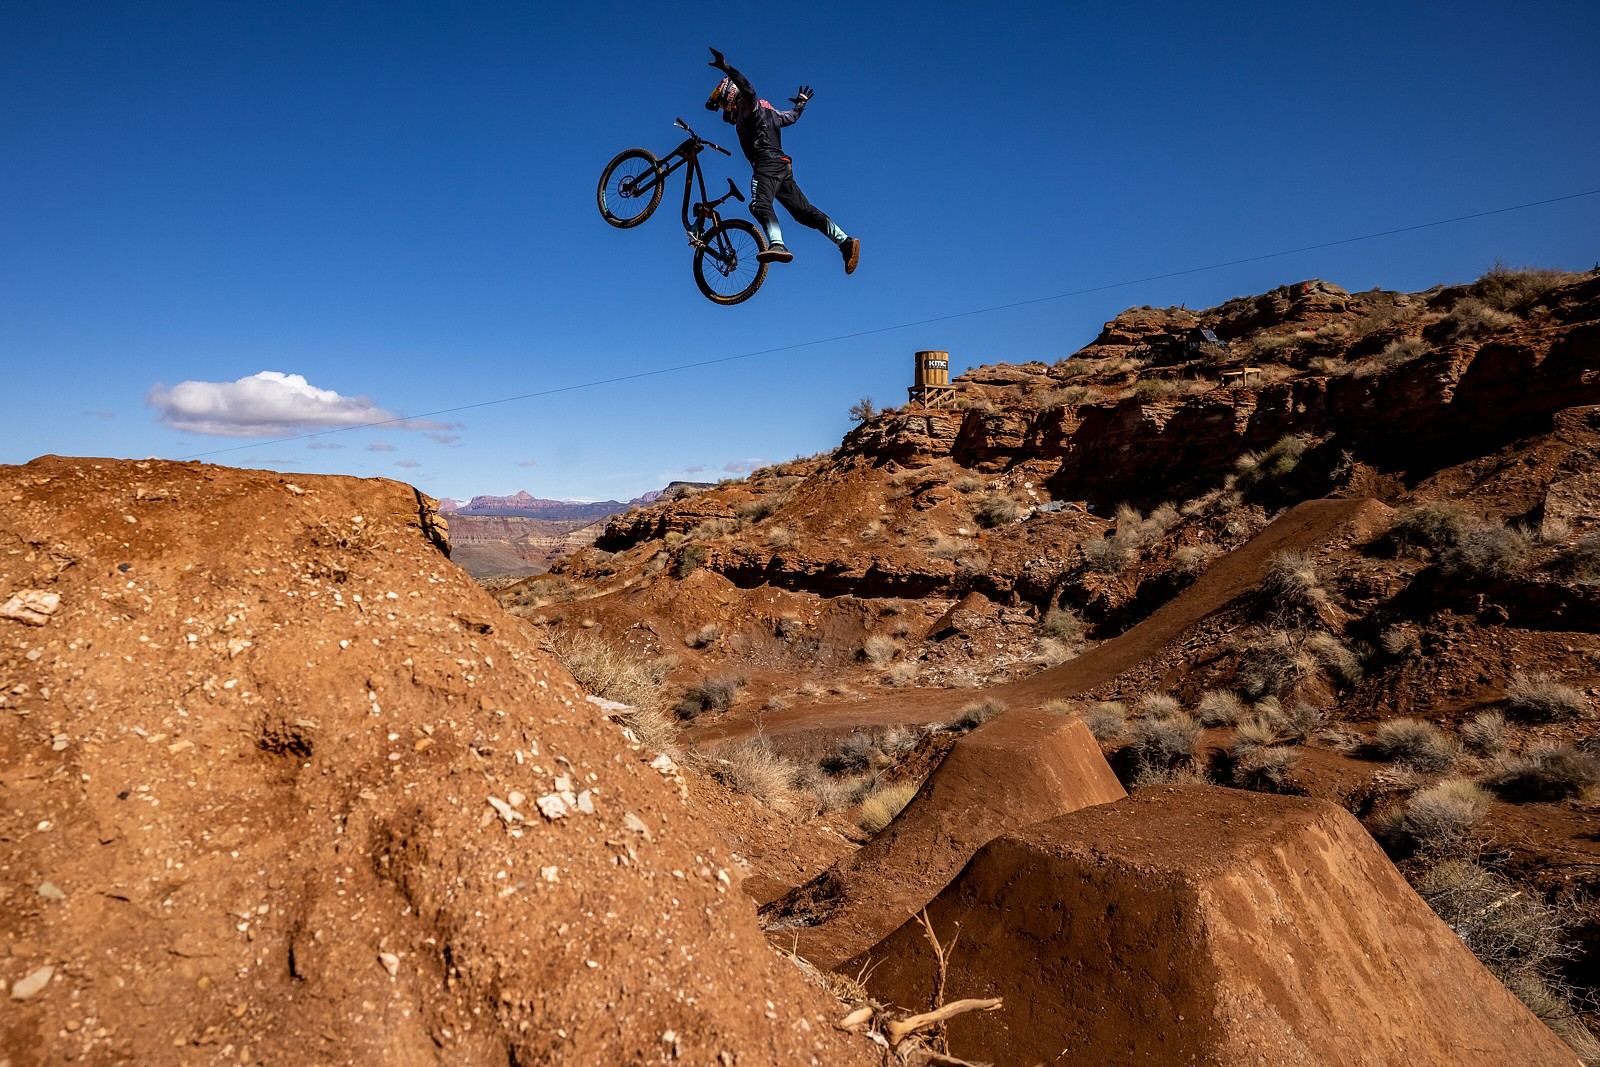 Szymon Godziek Nothing - 2021 Red Bull Rampage Photos - Mountain Biking Pictures - Vital MTB